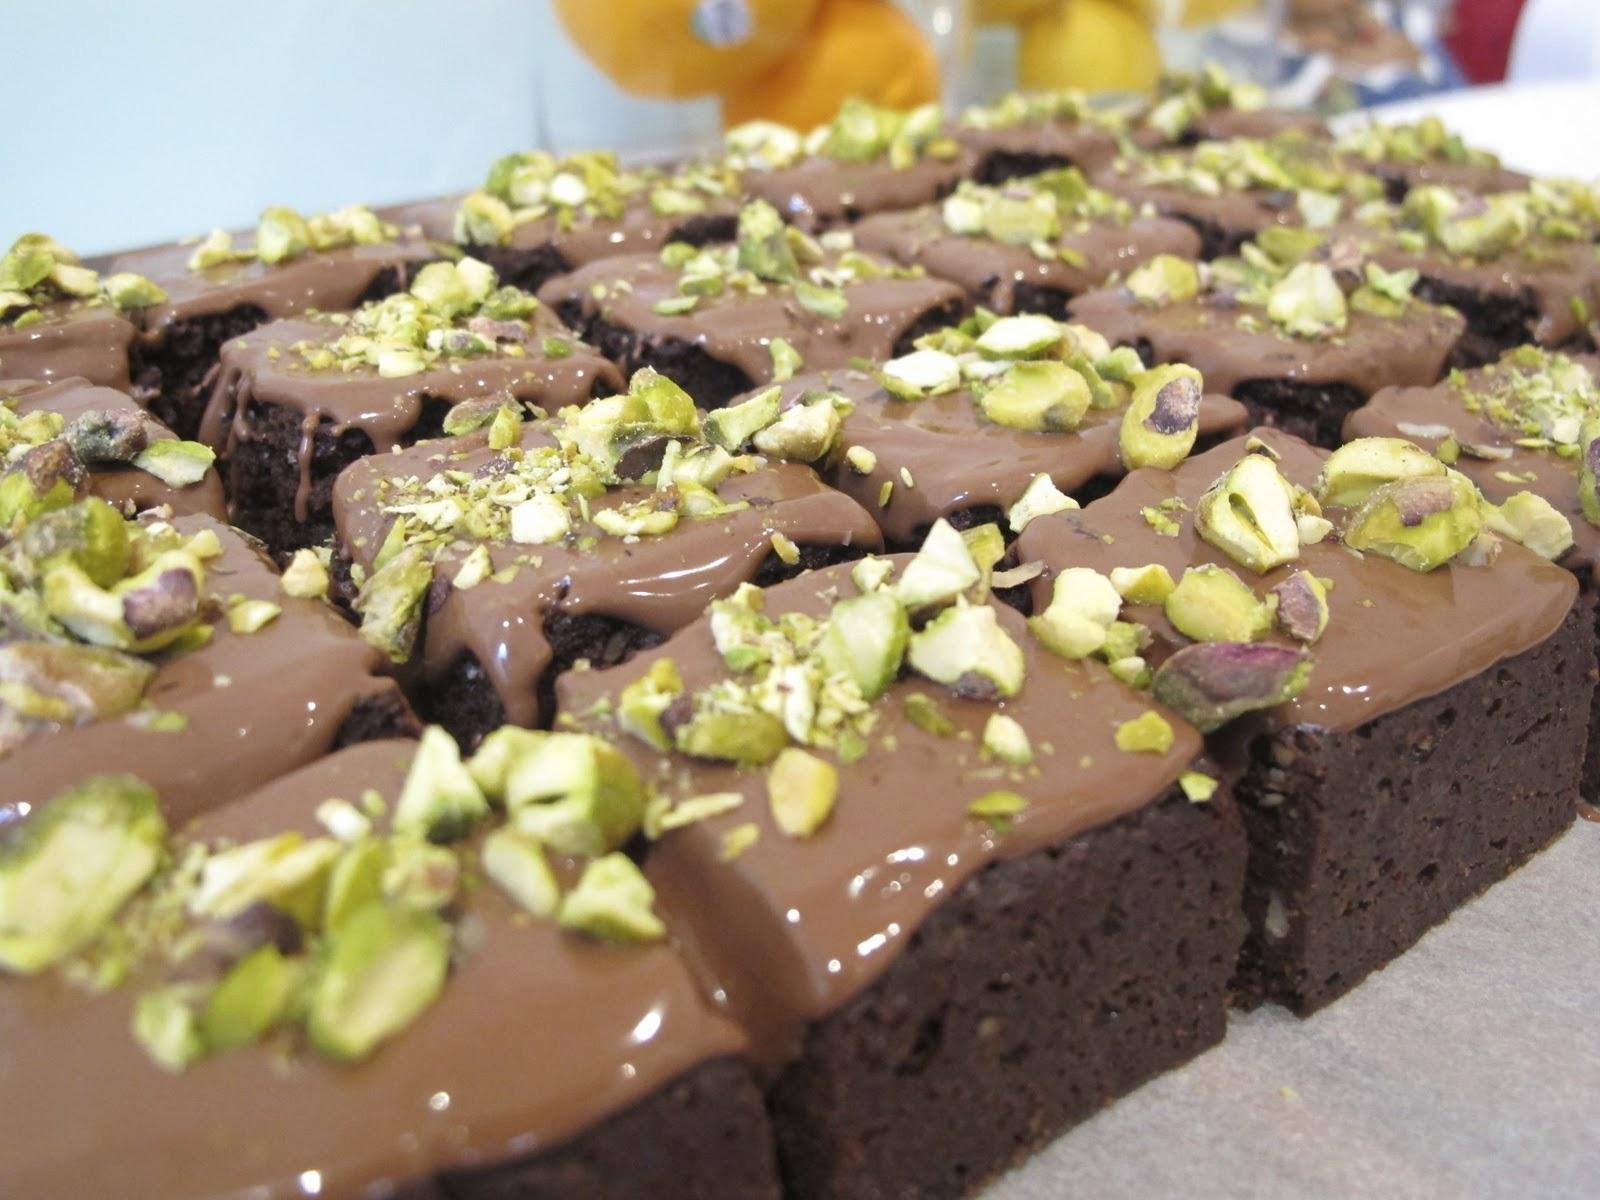 NoSetMenu: My favorite Brownies